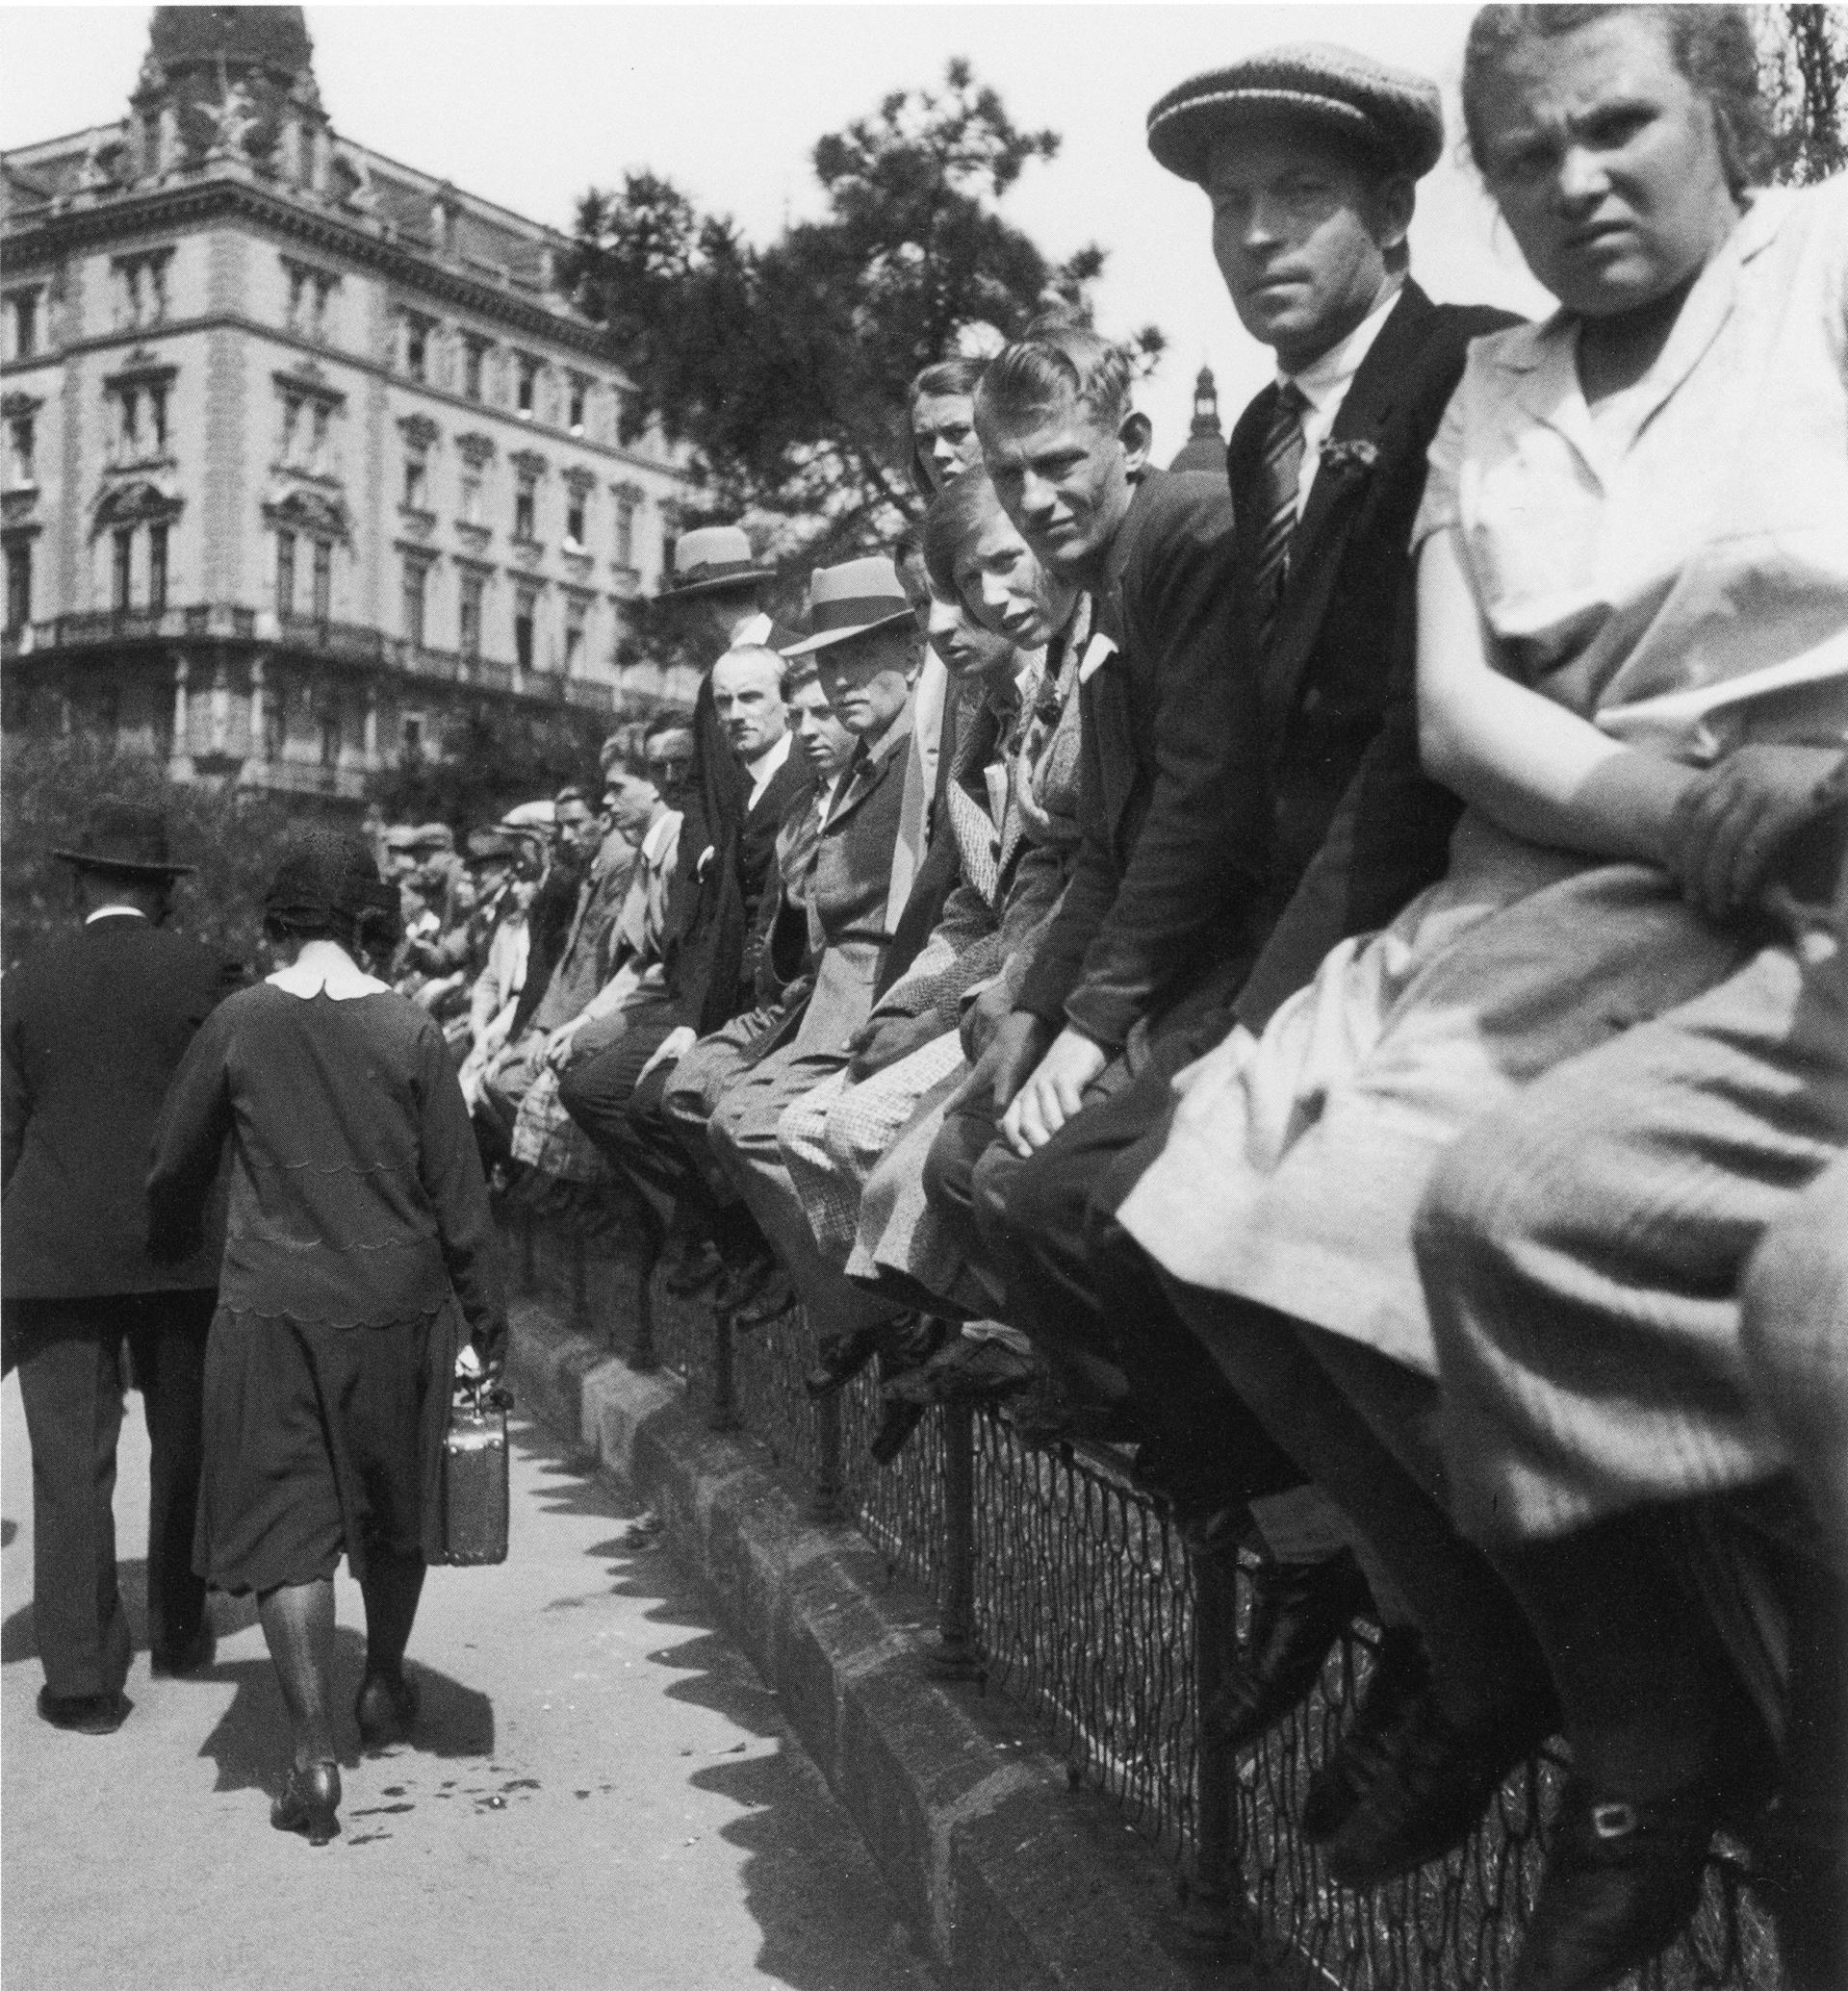 Auf Zaun Menge Wien 1930311.jpg